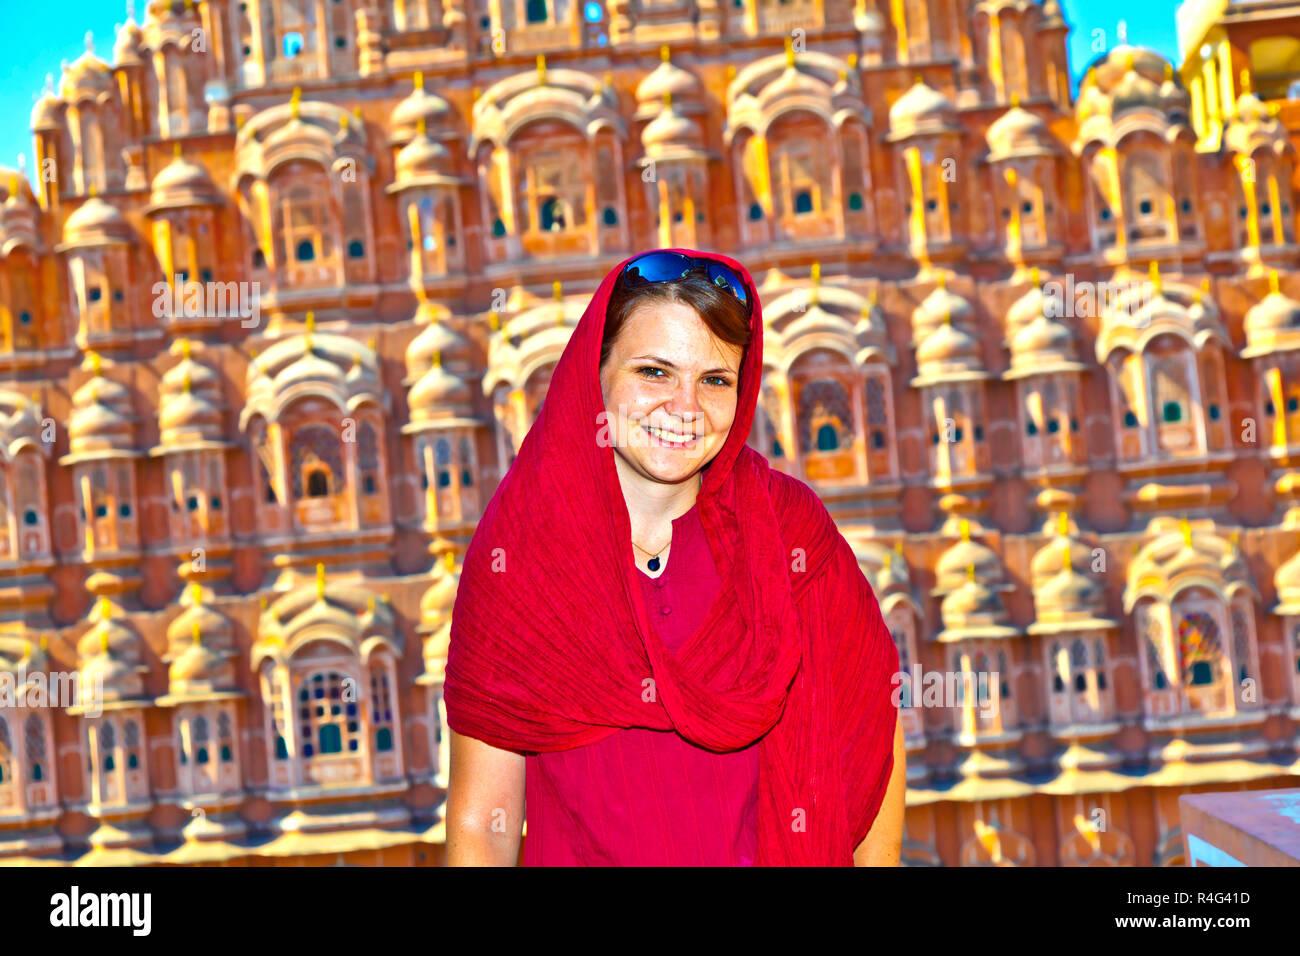 Girls Jaipur Stock Photos & Girls Jaipur Stock Images - Page 2 - Alamy